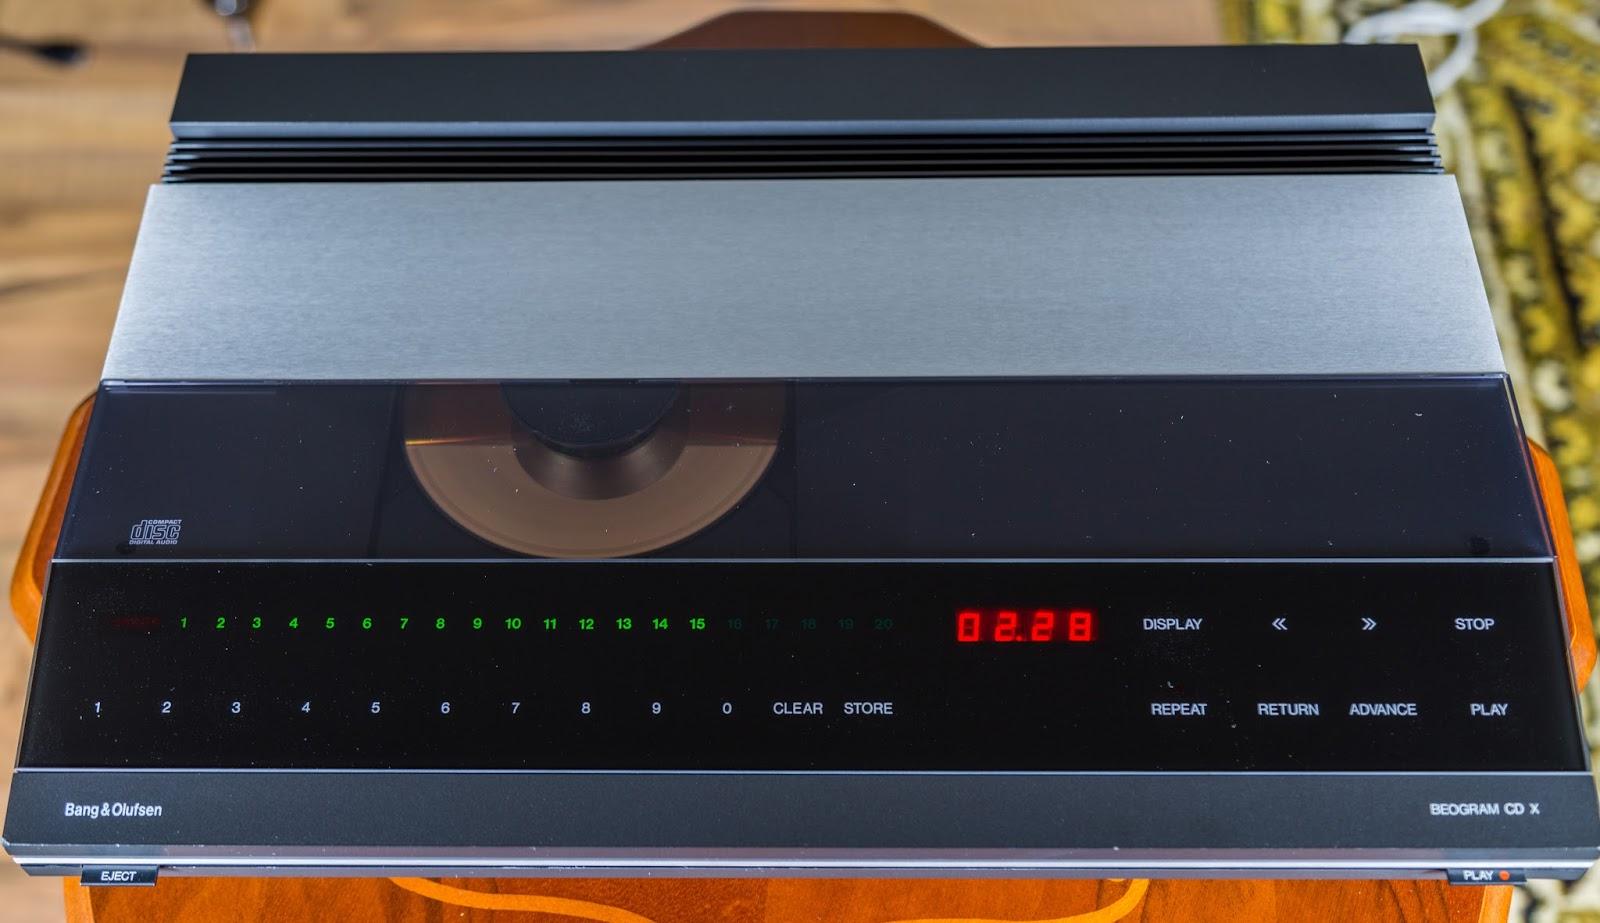 Golden Age Of Audio: Bang & Olufsen Beogram CDX Vintage CD